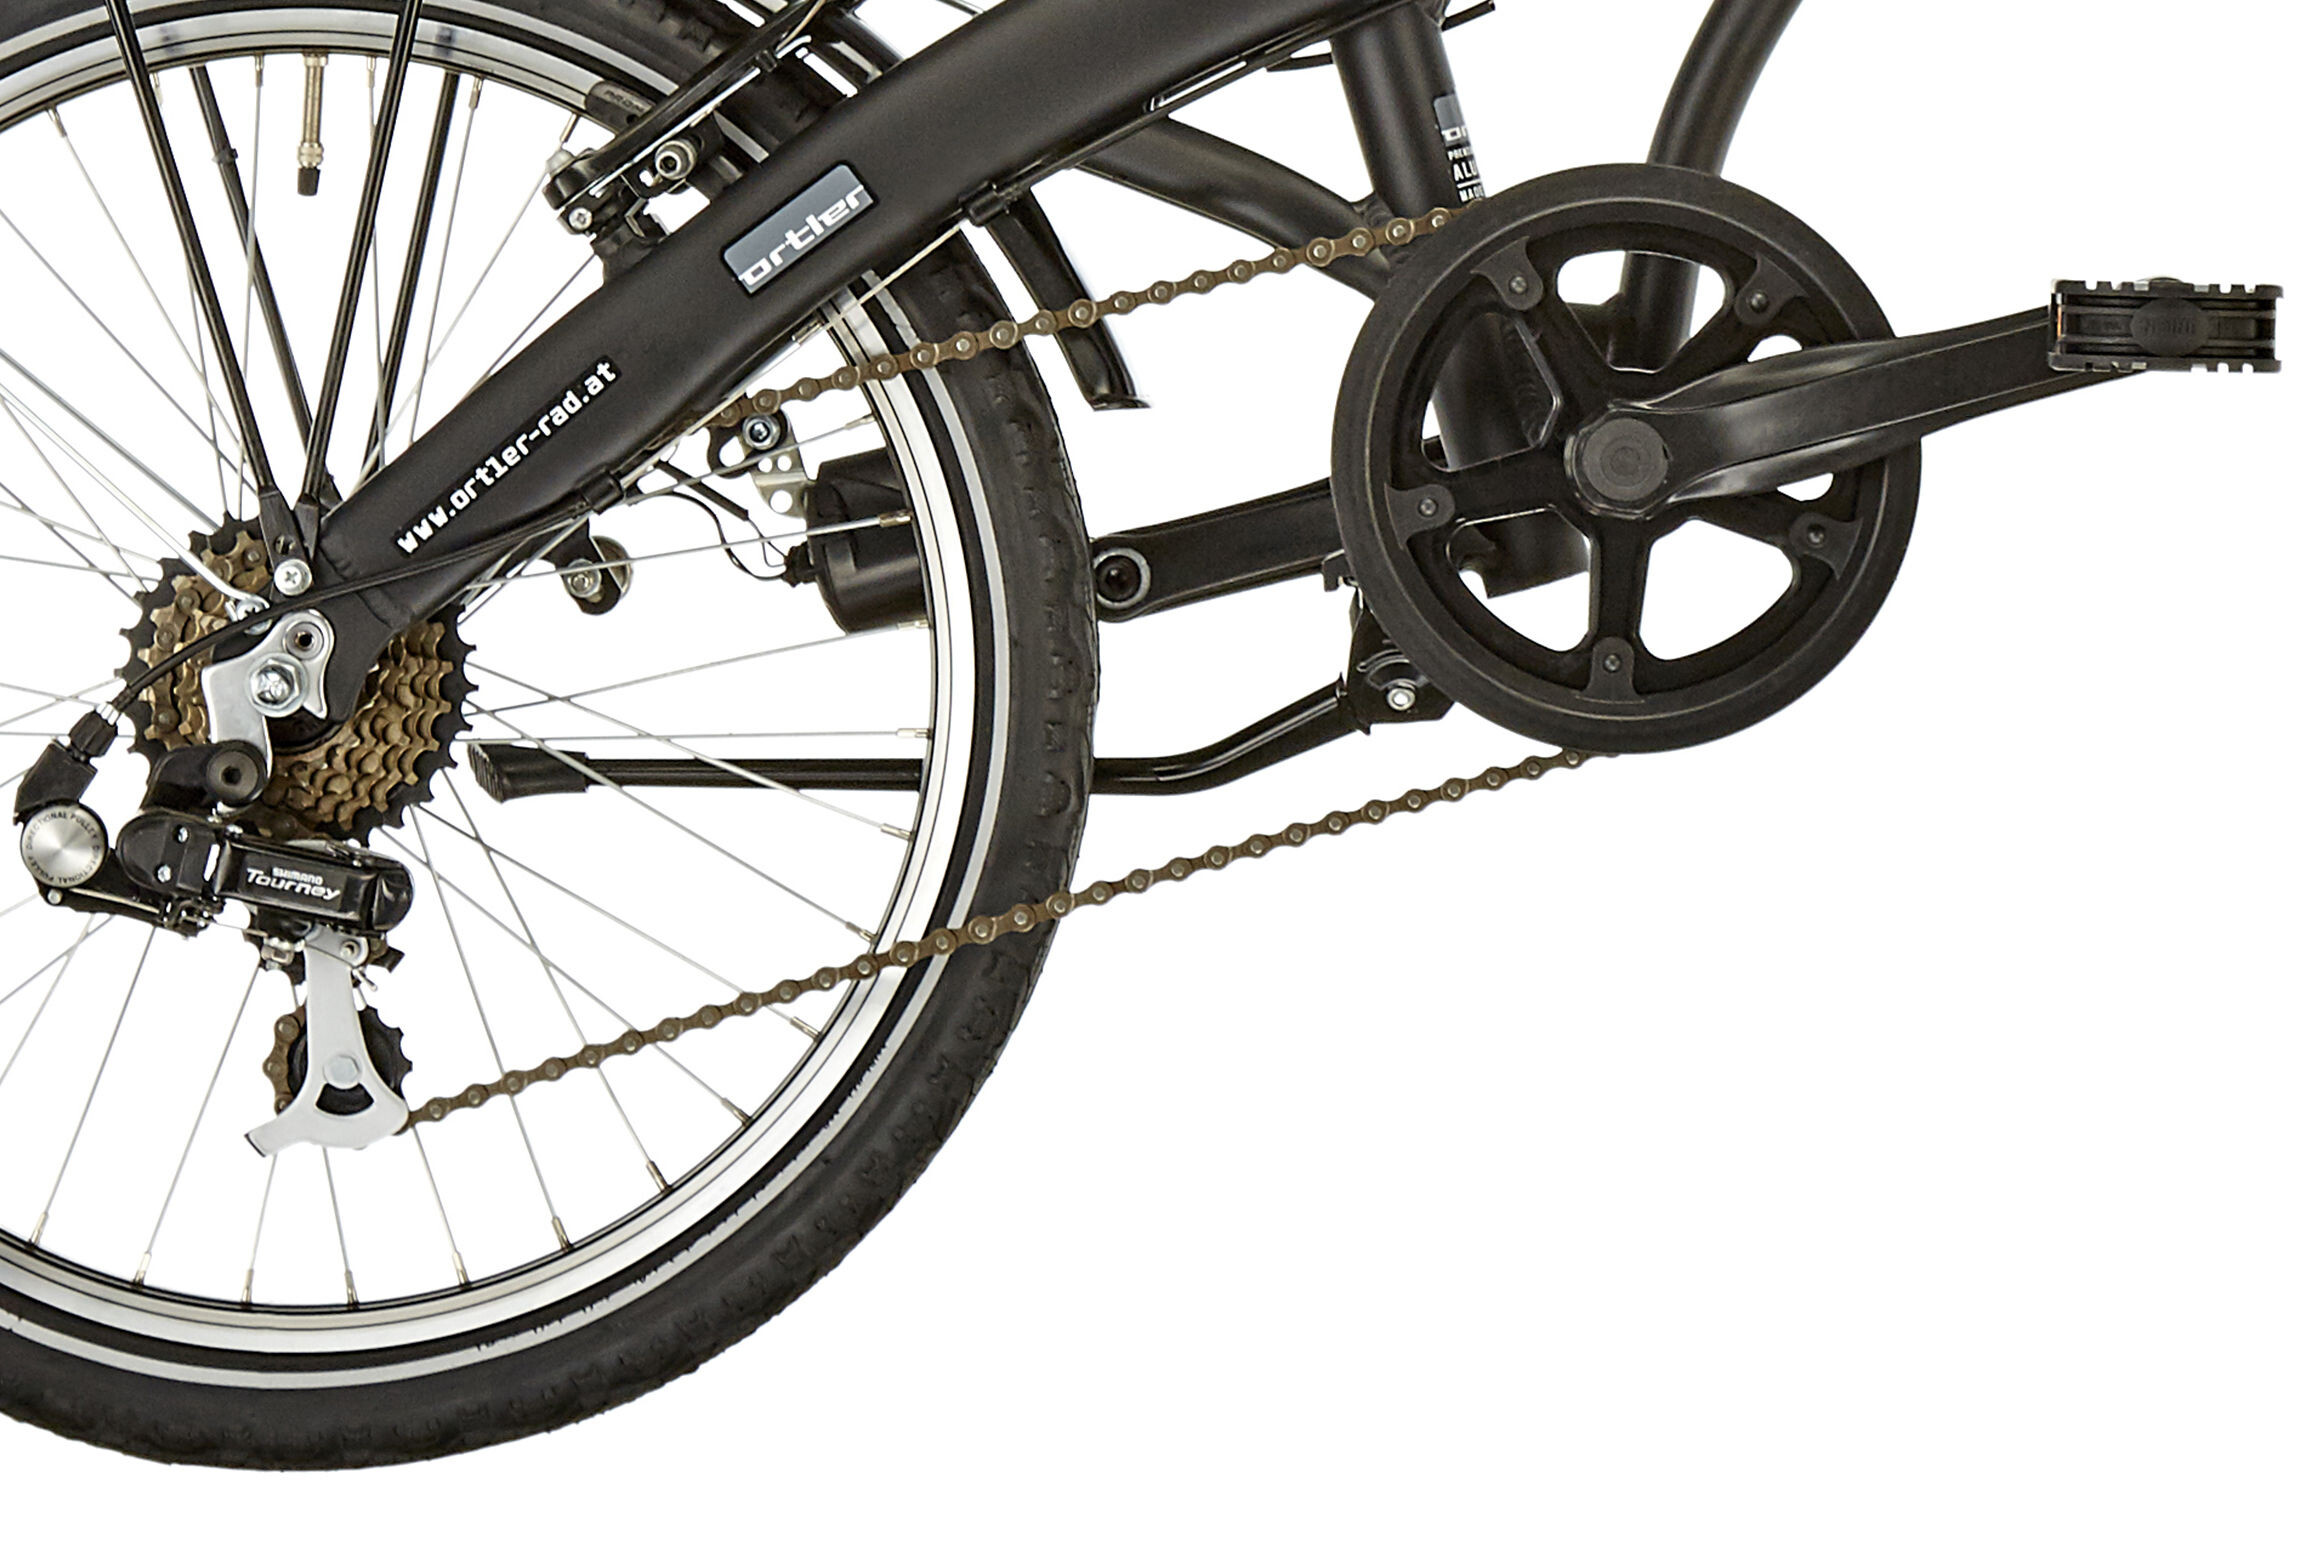 Ortler Norwood 20 Bicicletas Plegables Negro Mate